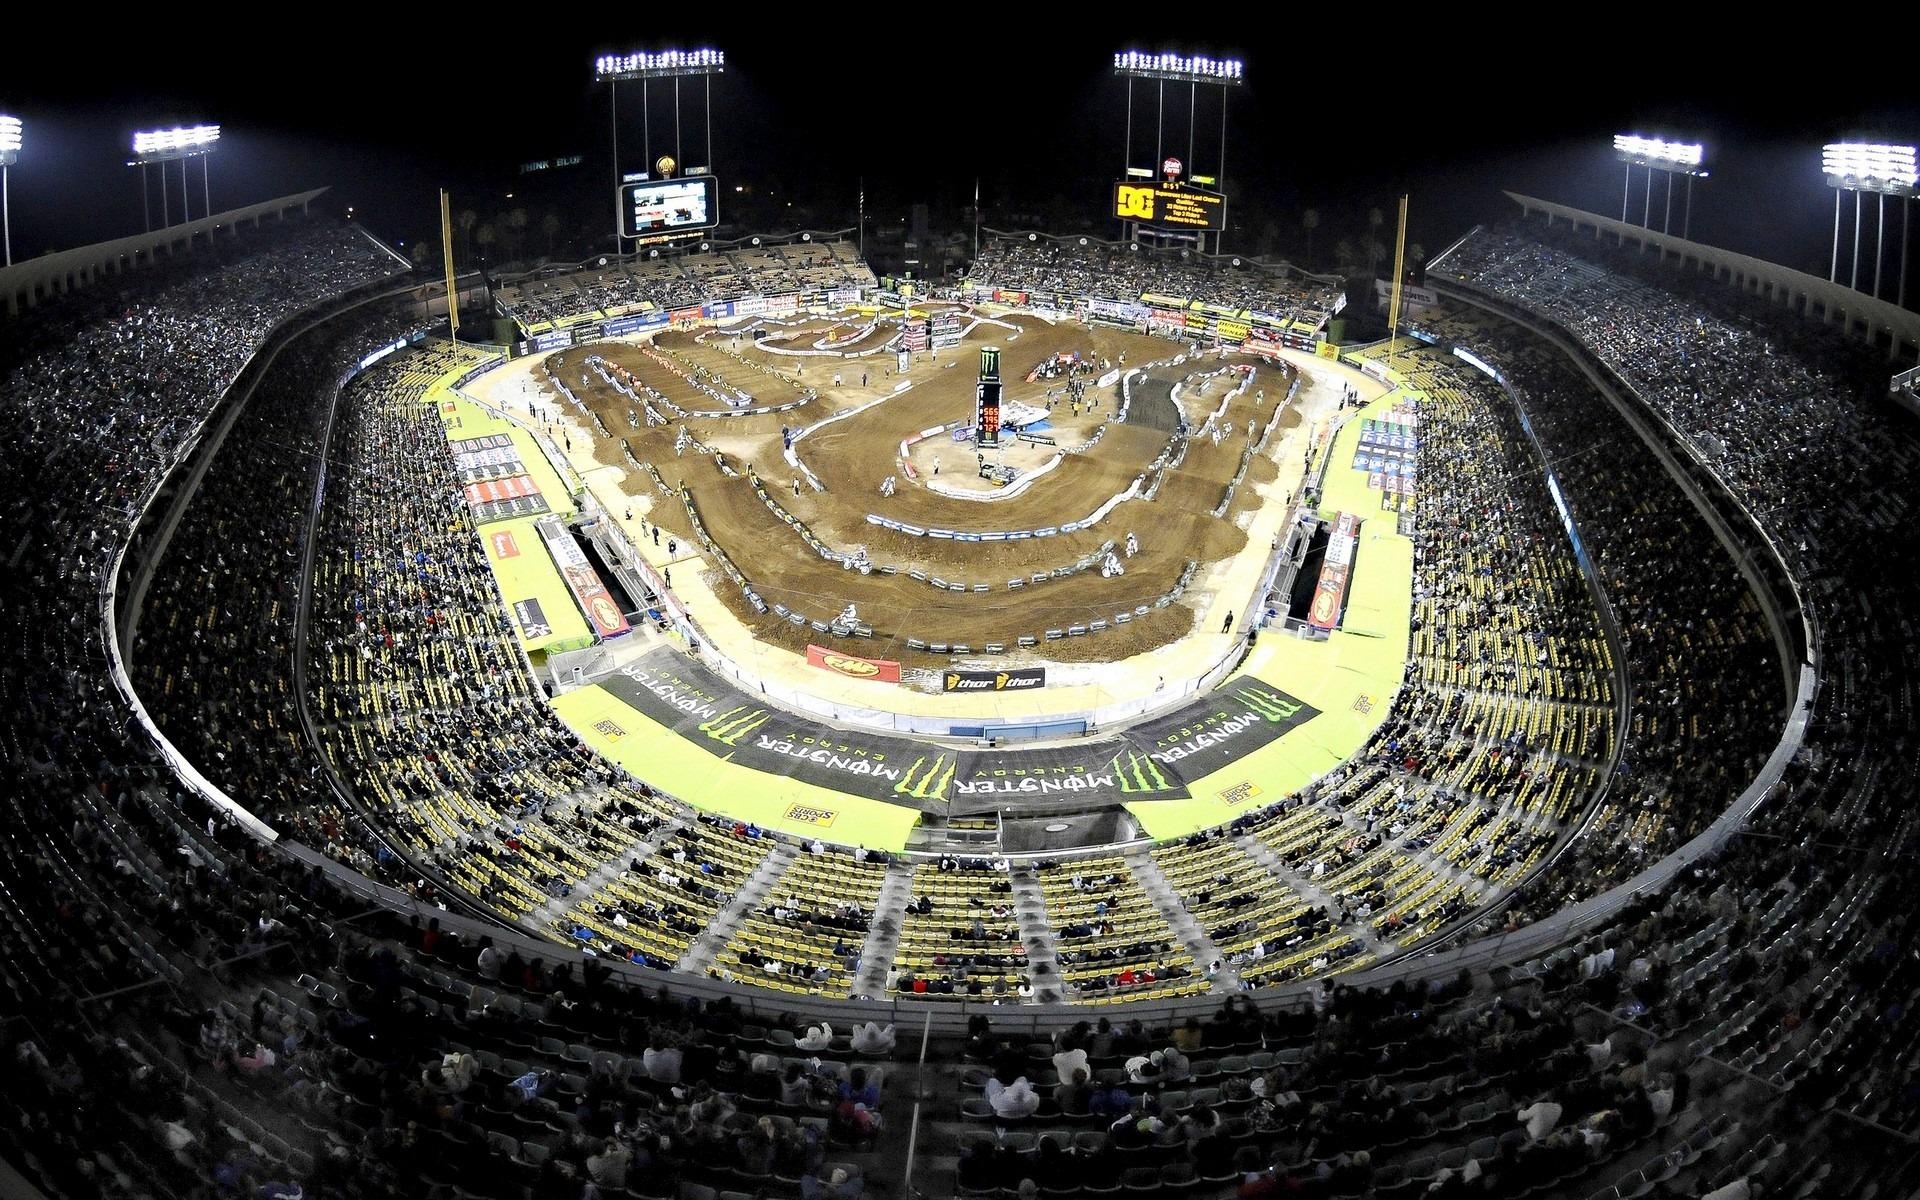 мототрек, гонки, стадион